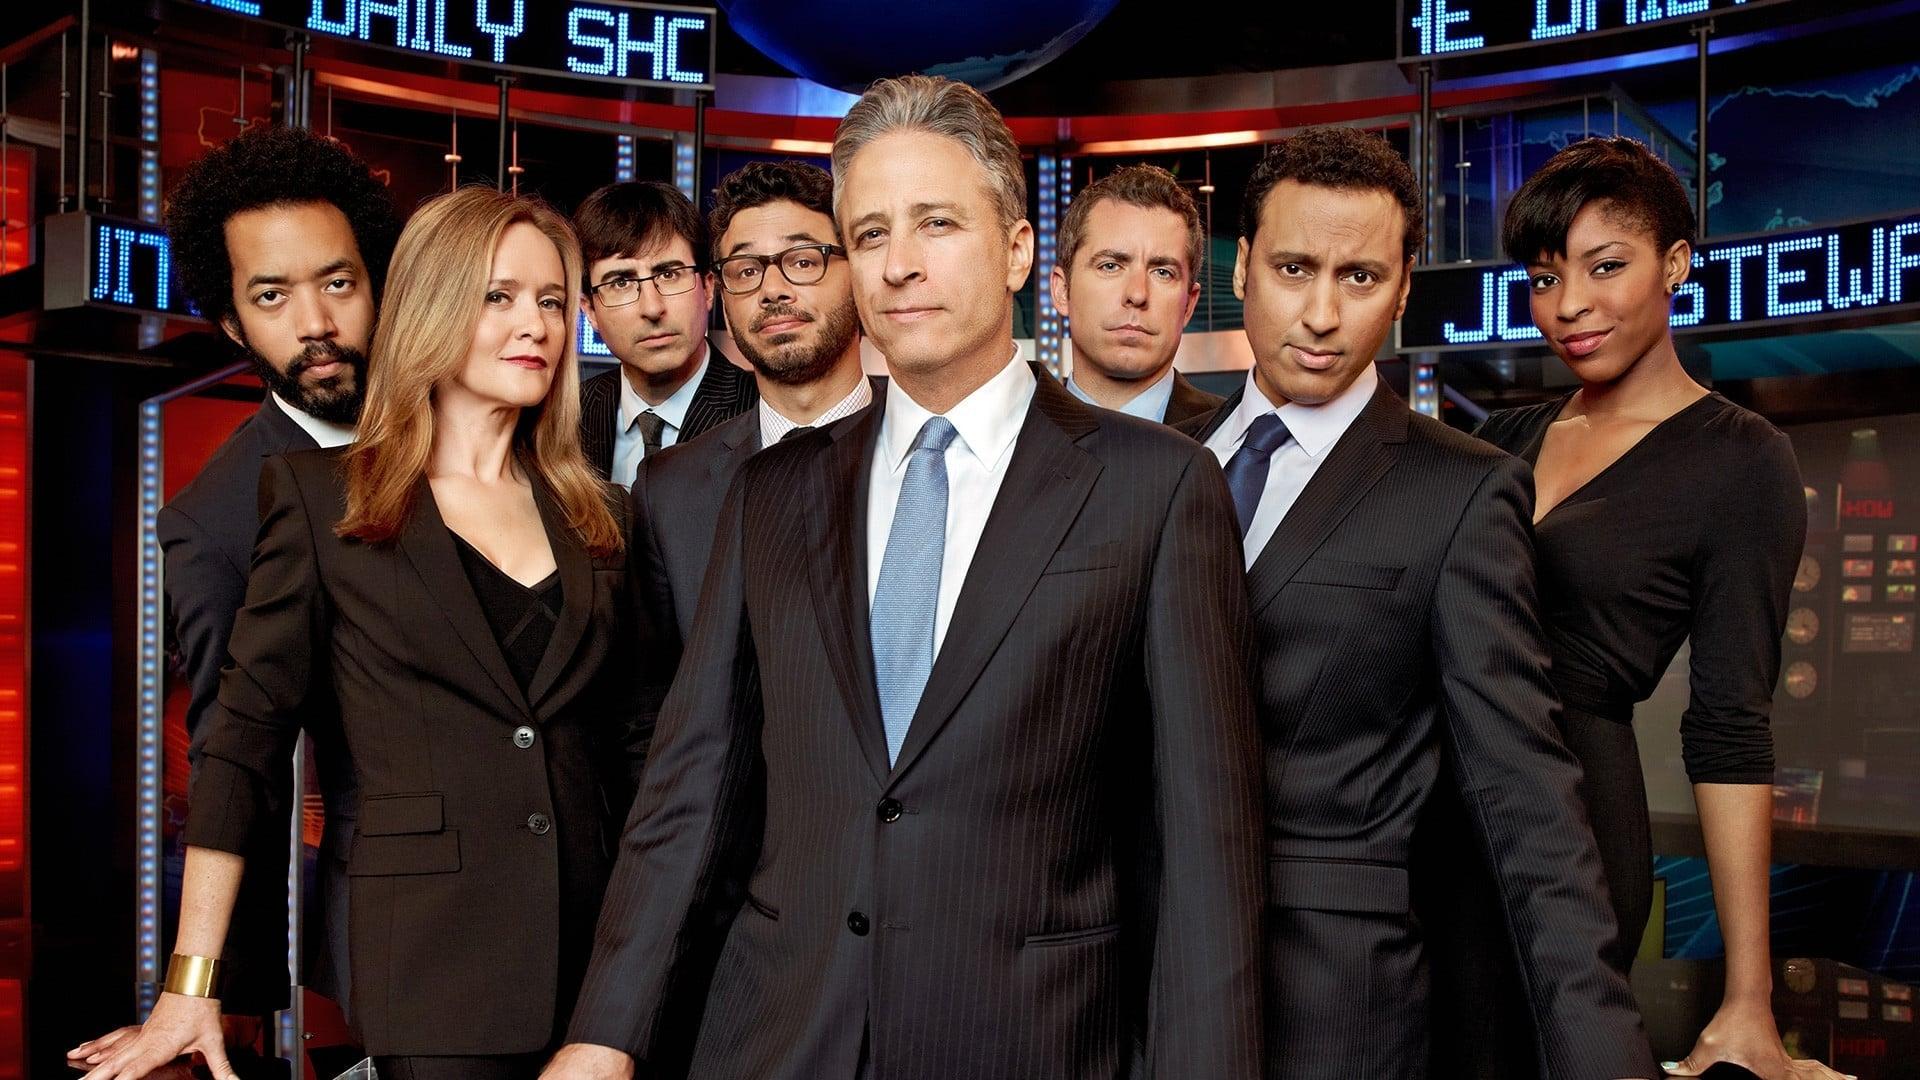 The Daily Show with Trevor Noah - Season 2